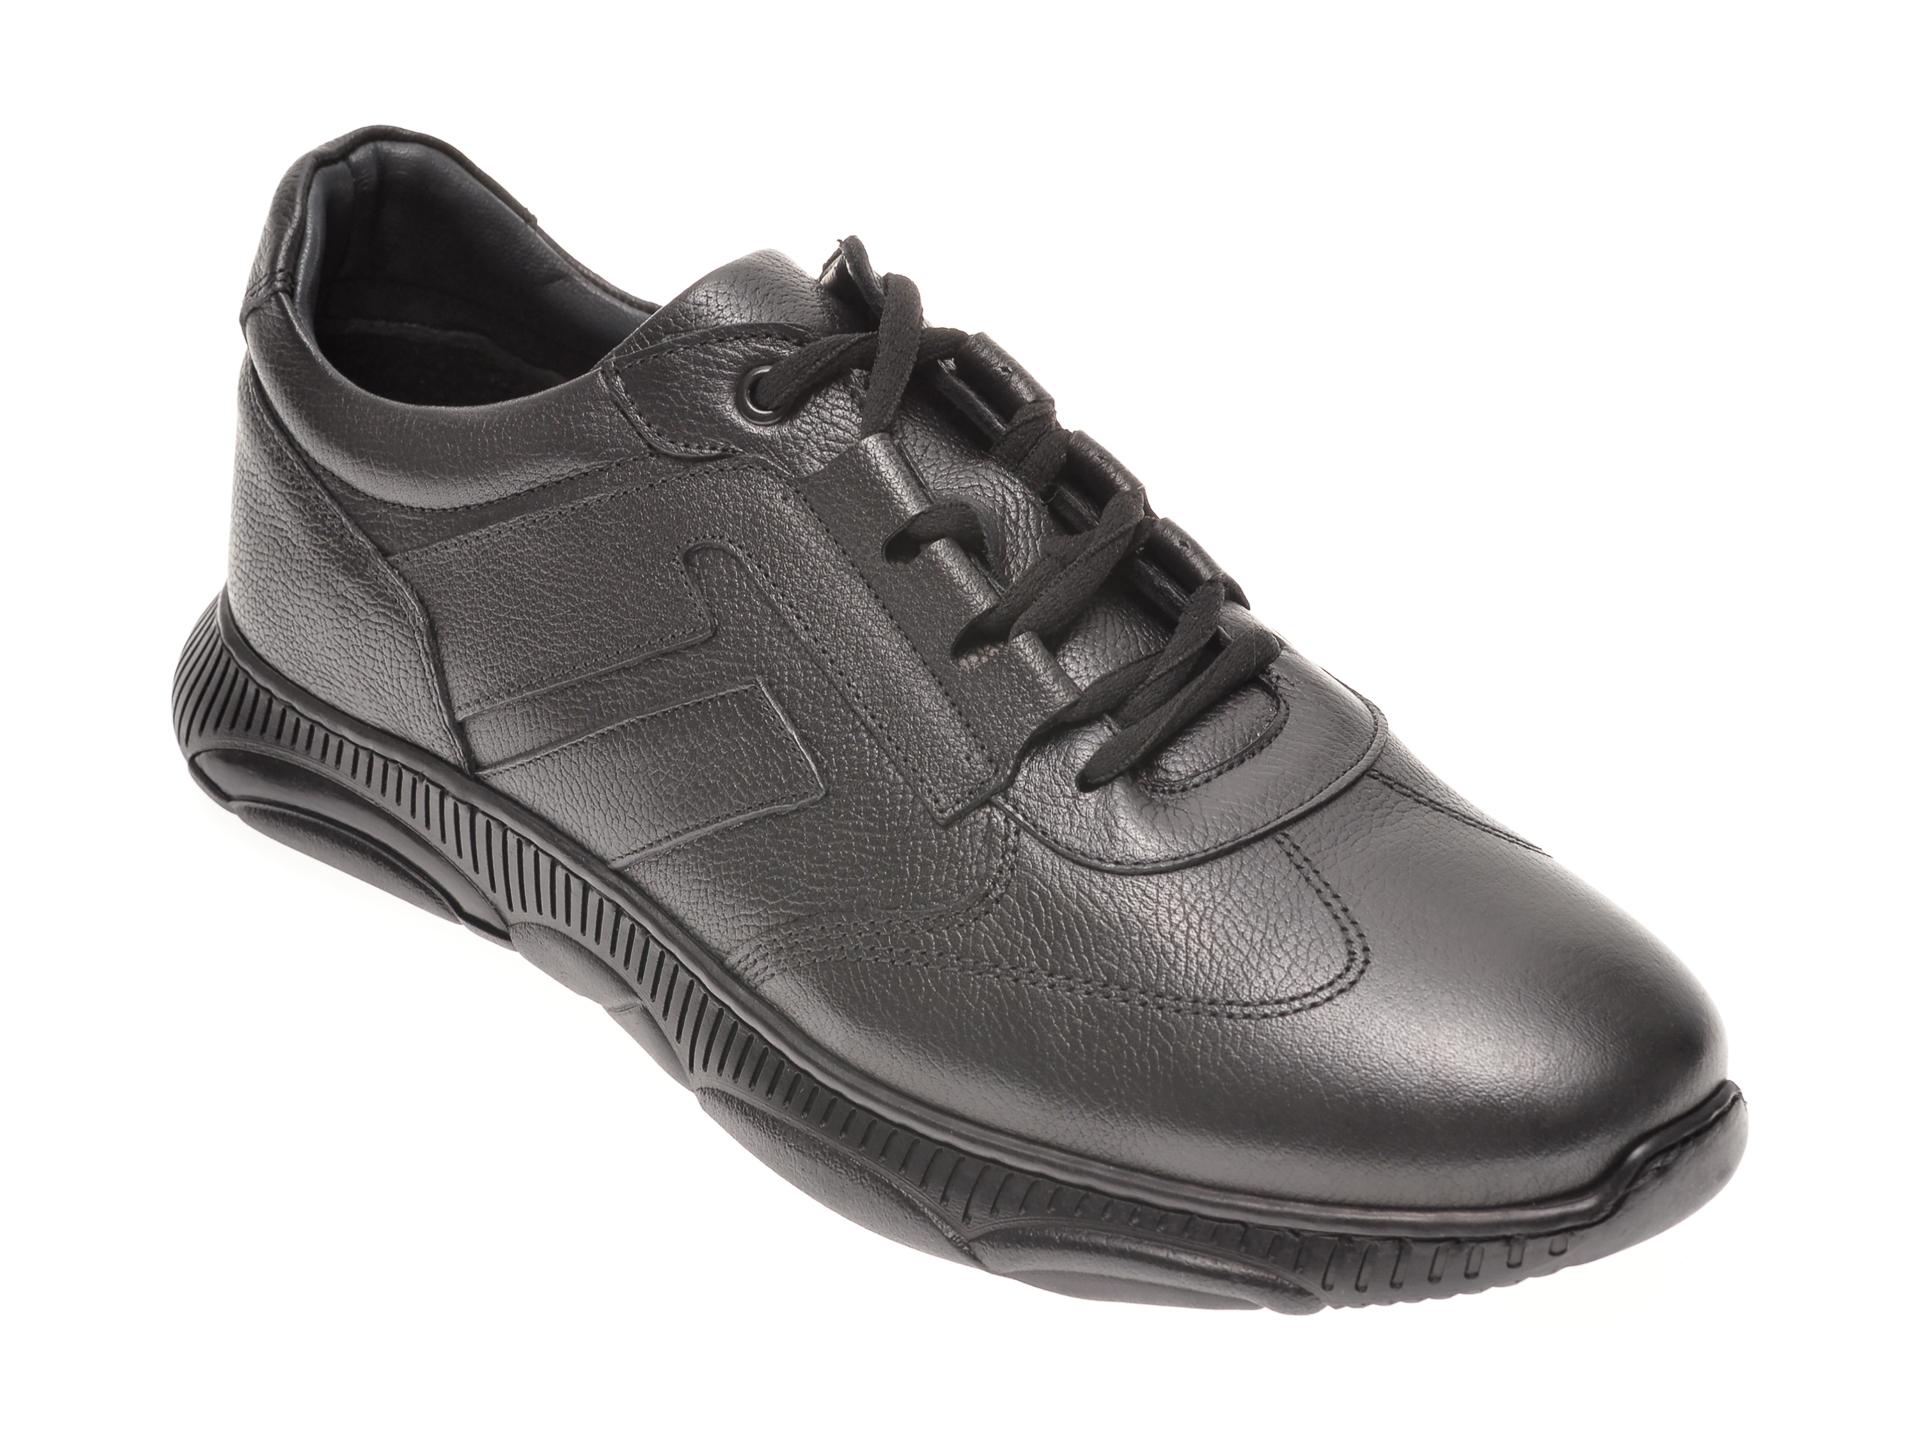 Pantofi OTTER negri, 37109, din piele naturala New